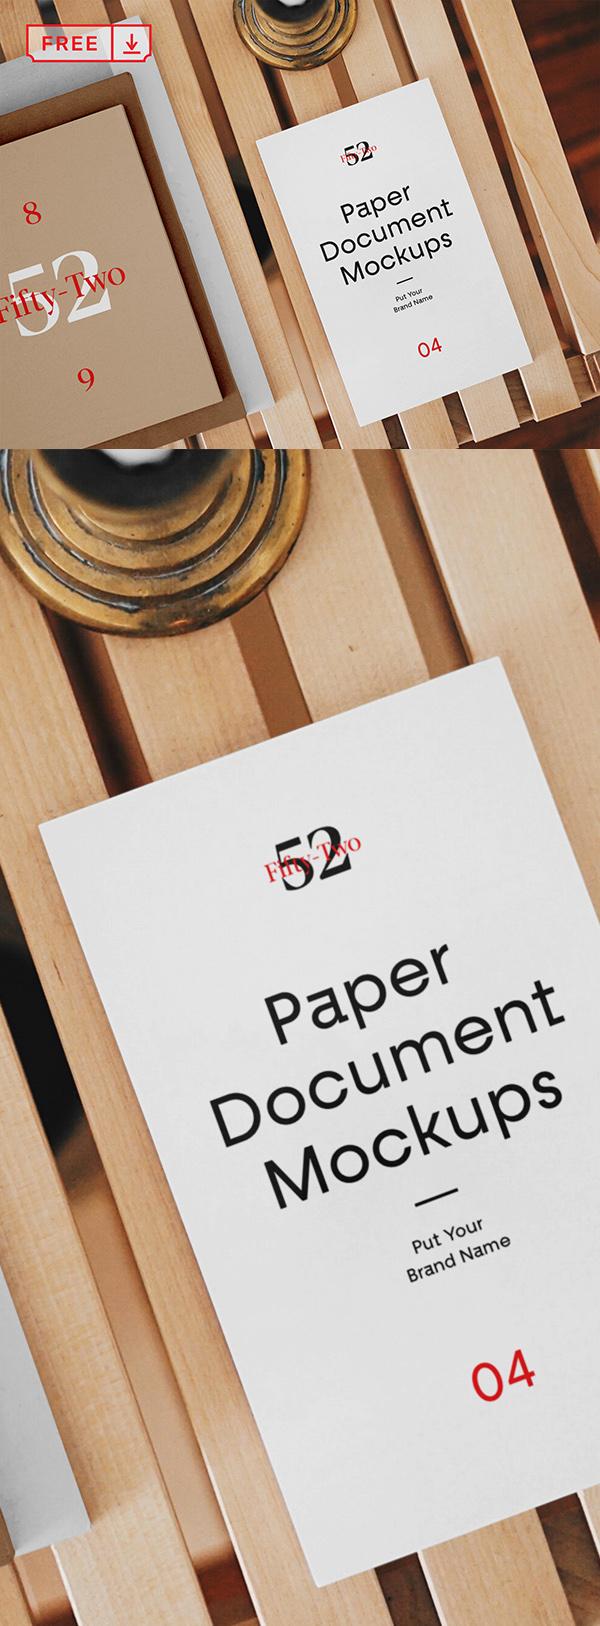 Free Paper Document Mockups